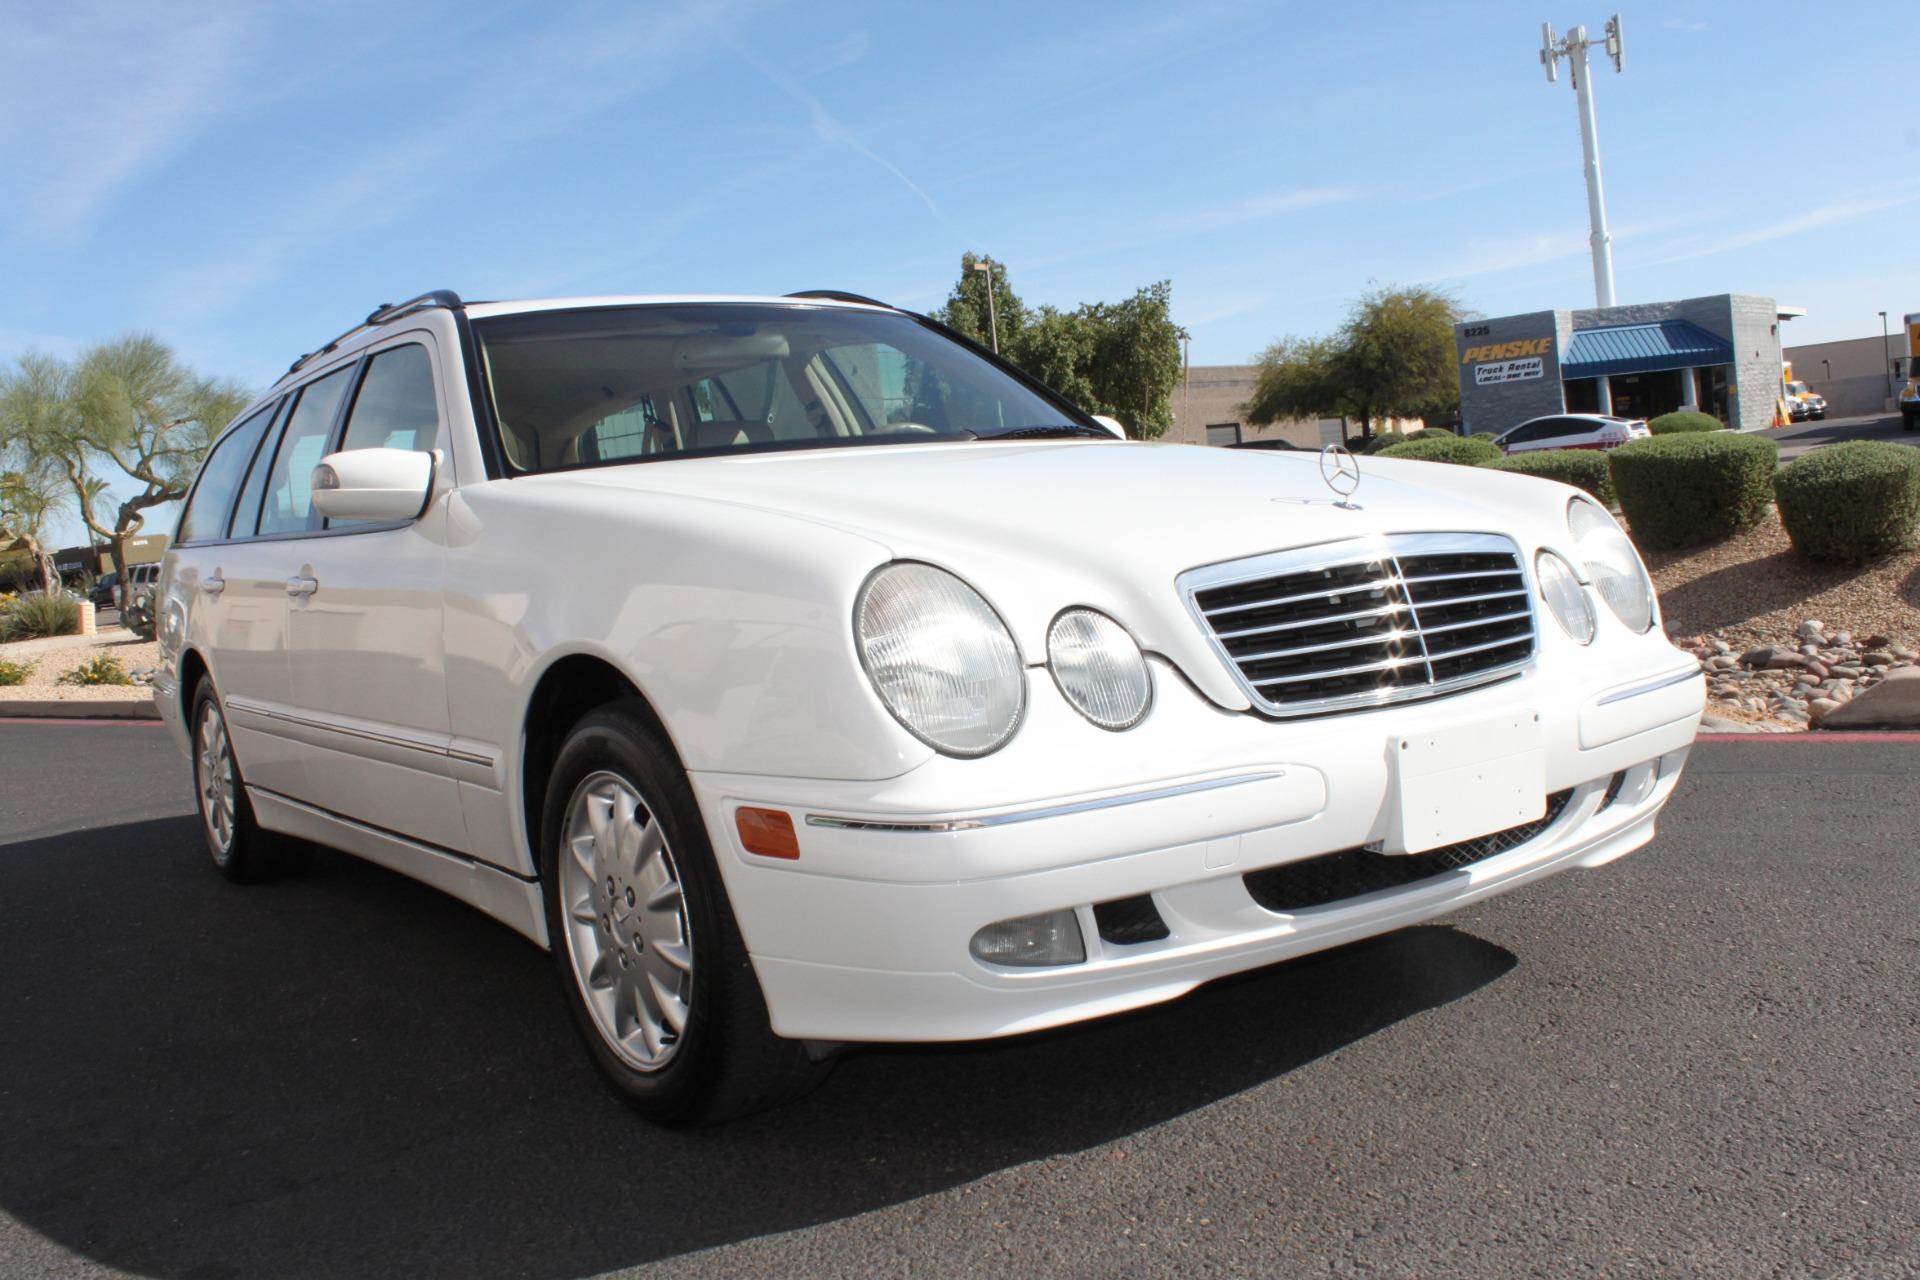 Used-2000-Mercedes-Benz-E-Class-Cherokee